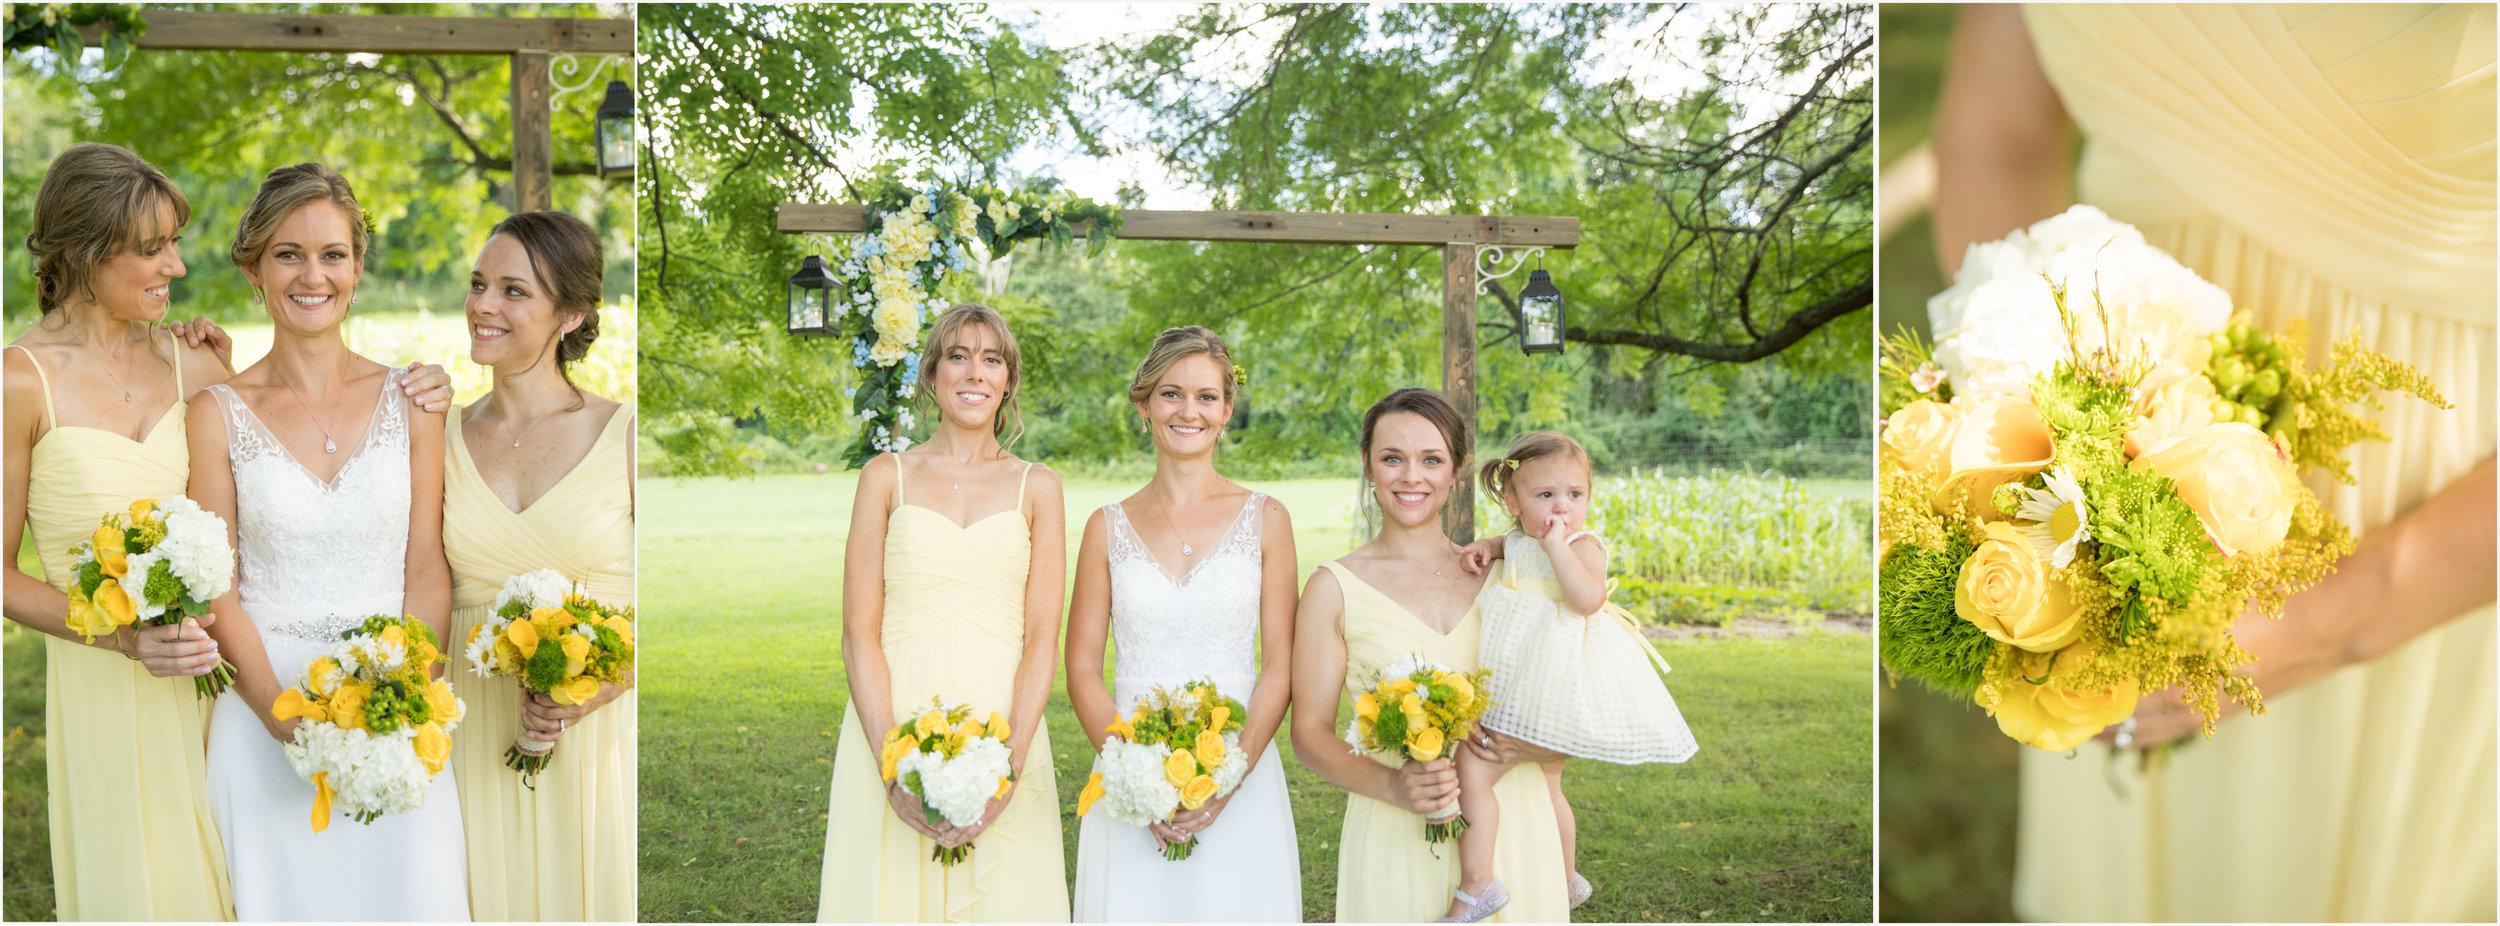 Cassondre Mae Photography Warwick NY Wedding Photographer -13.jpg